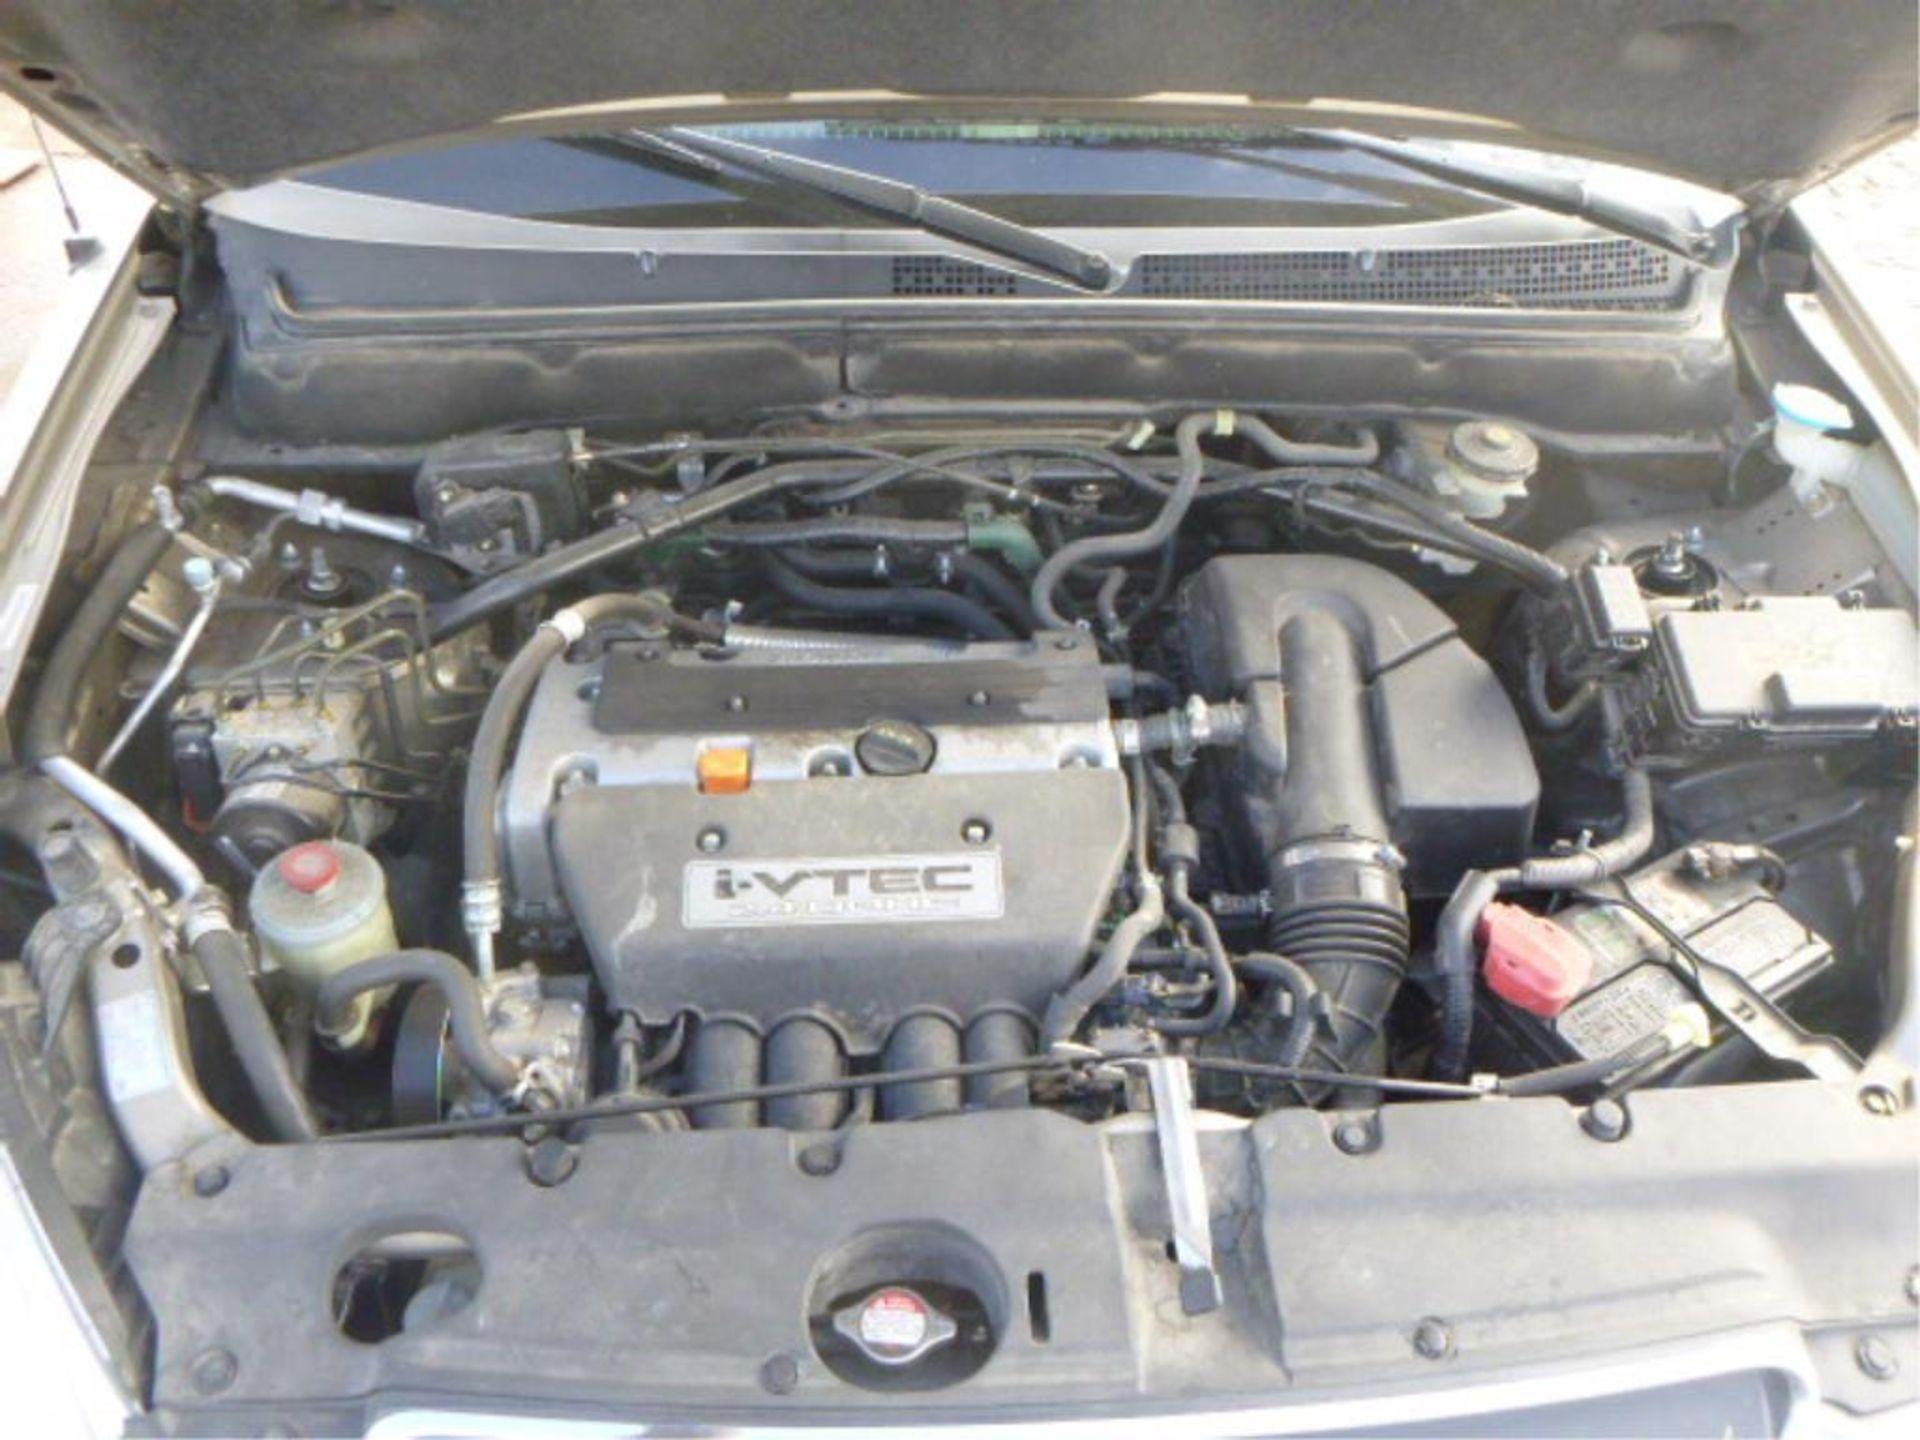 2005 Honda CR-V - Image 6 of 14